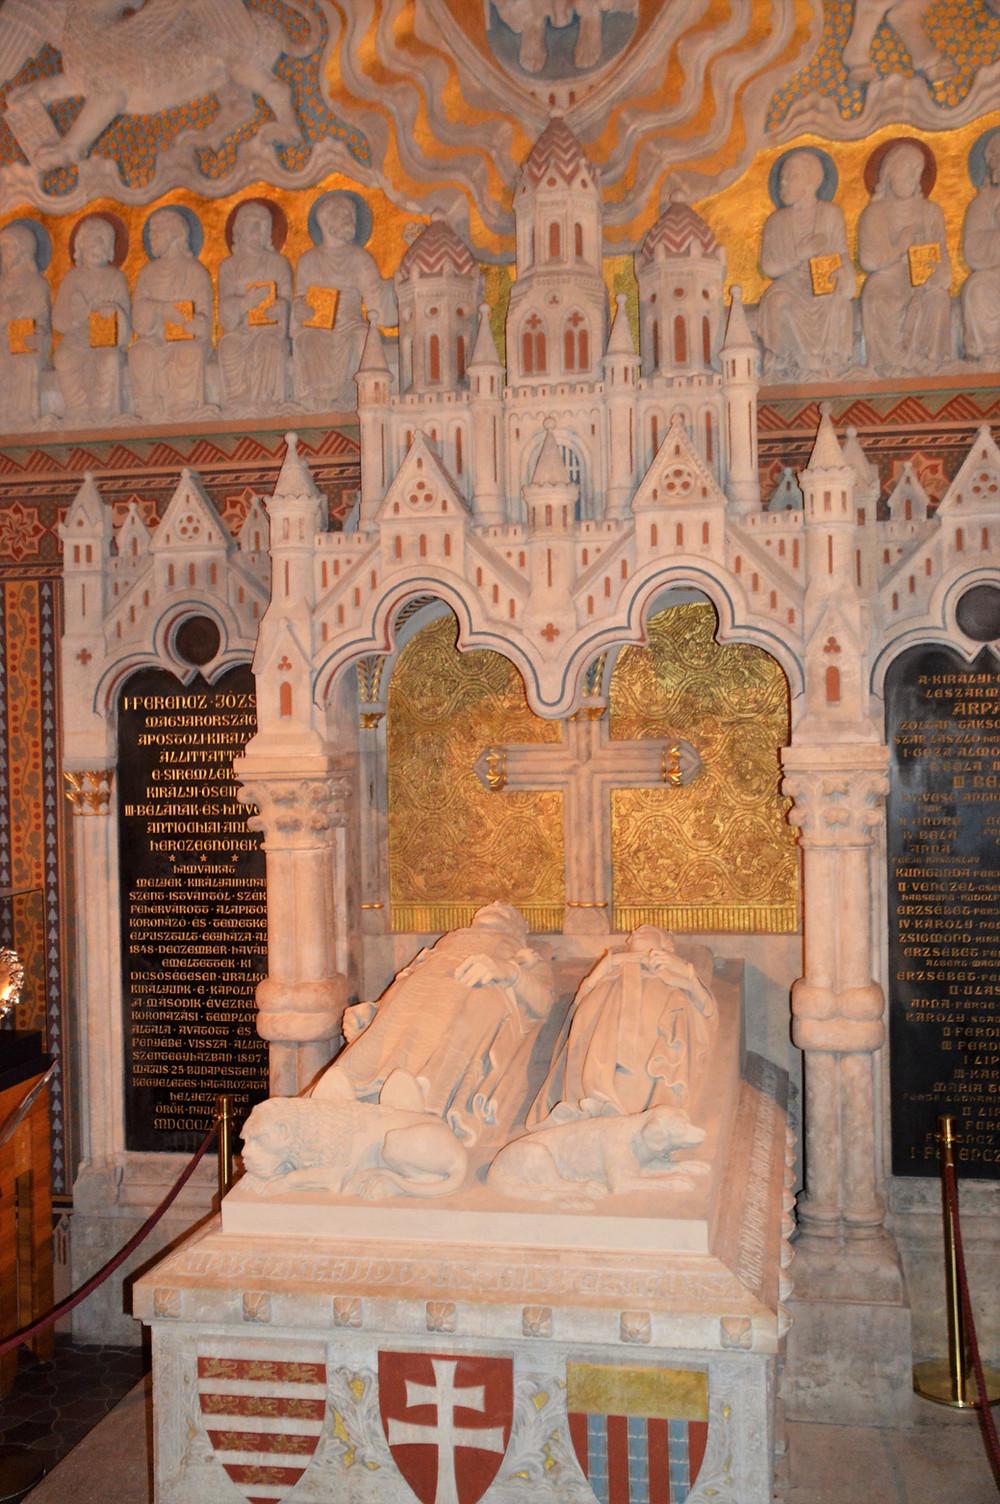 Inside Mattias Church is the sarcophagus of the 12th century King Béla III and his wife Anne de Châtillon.